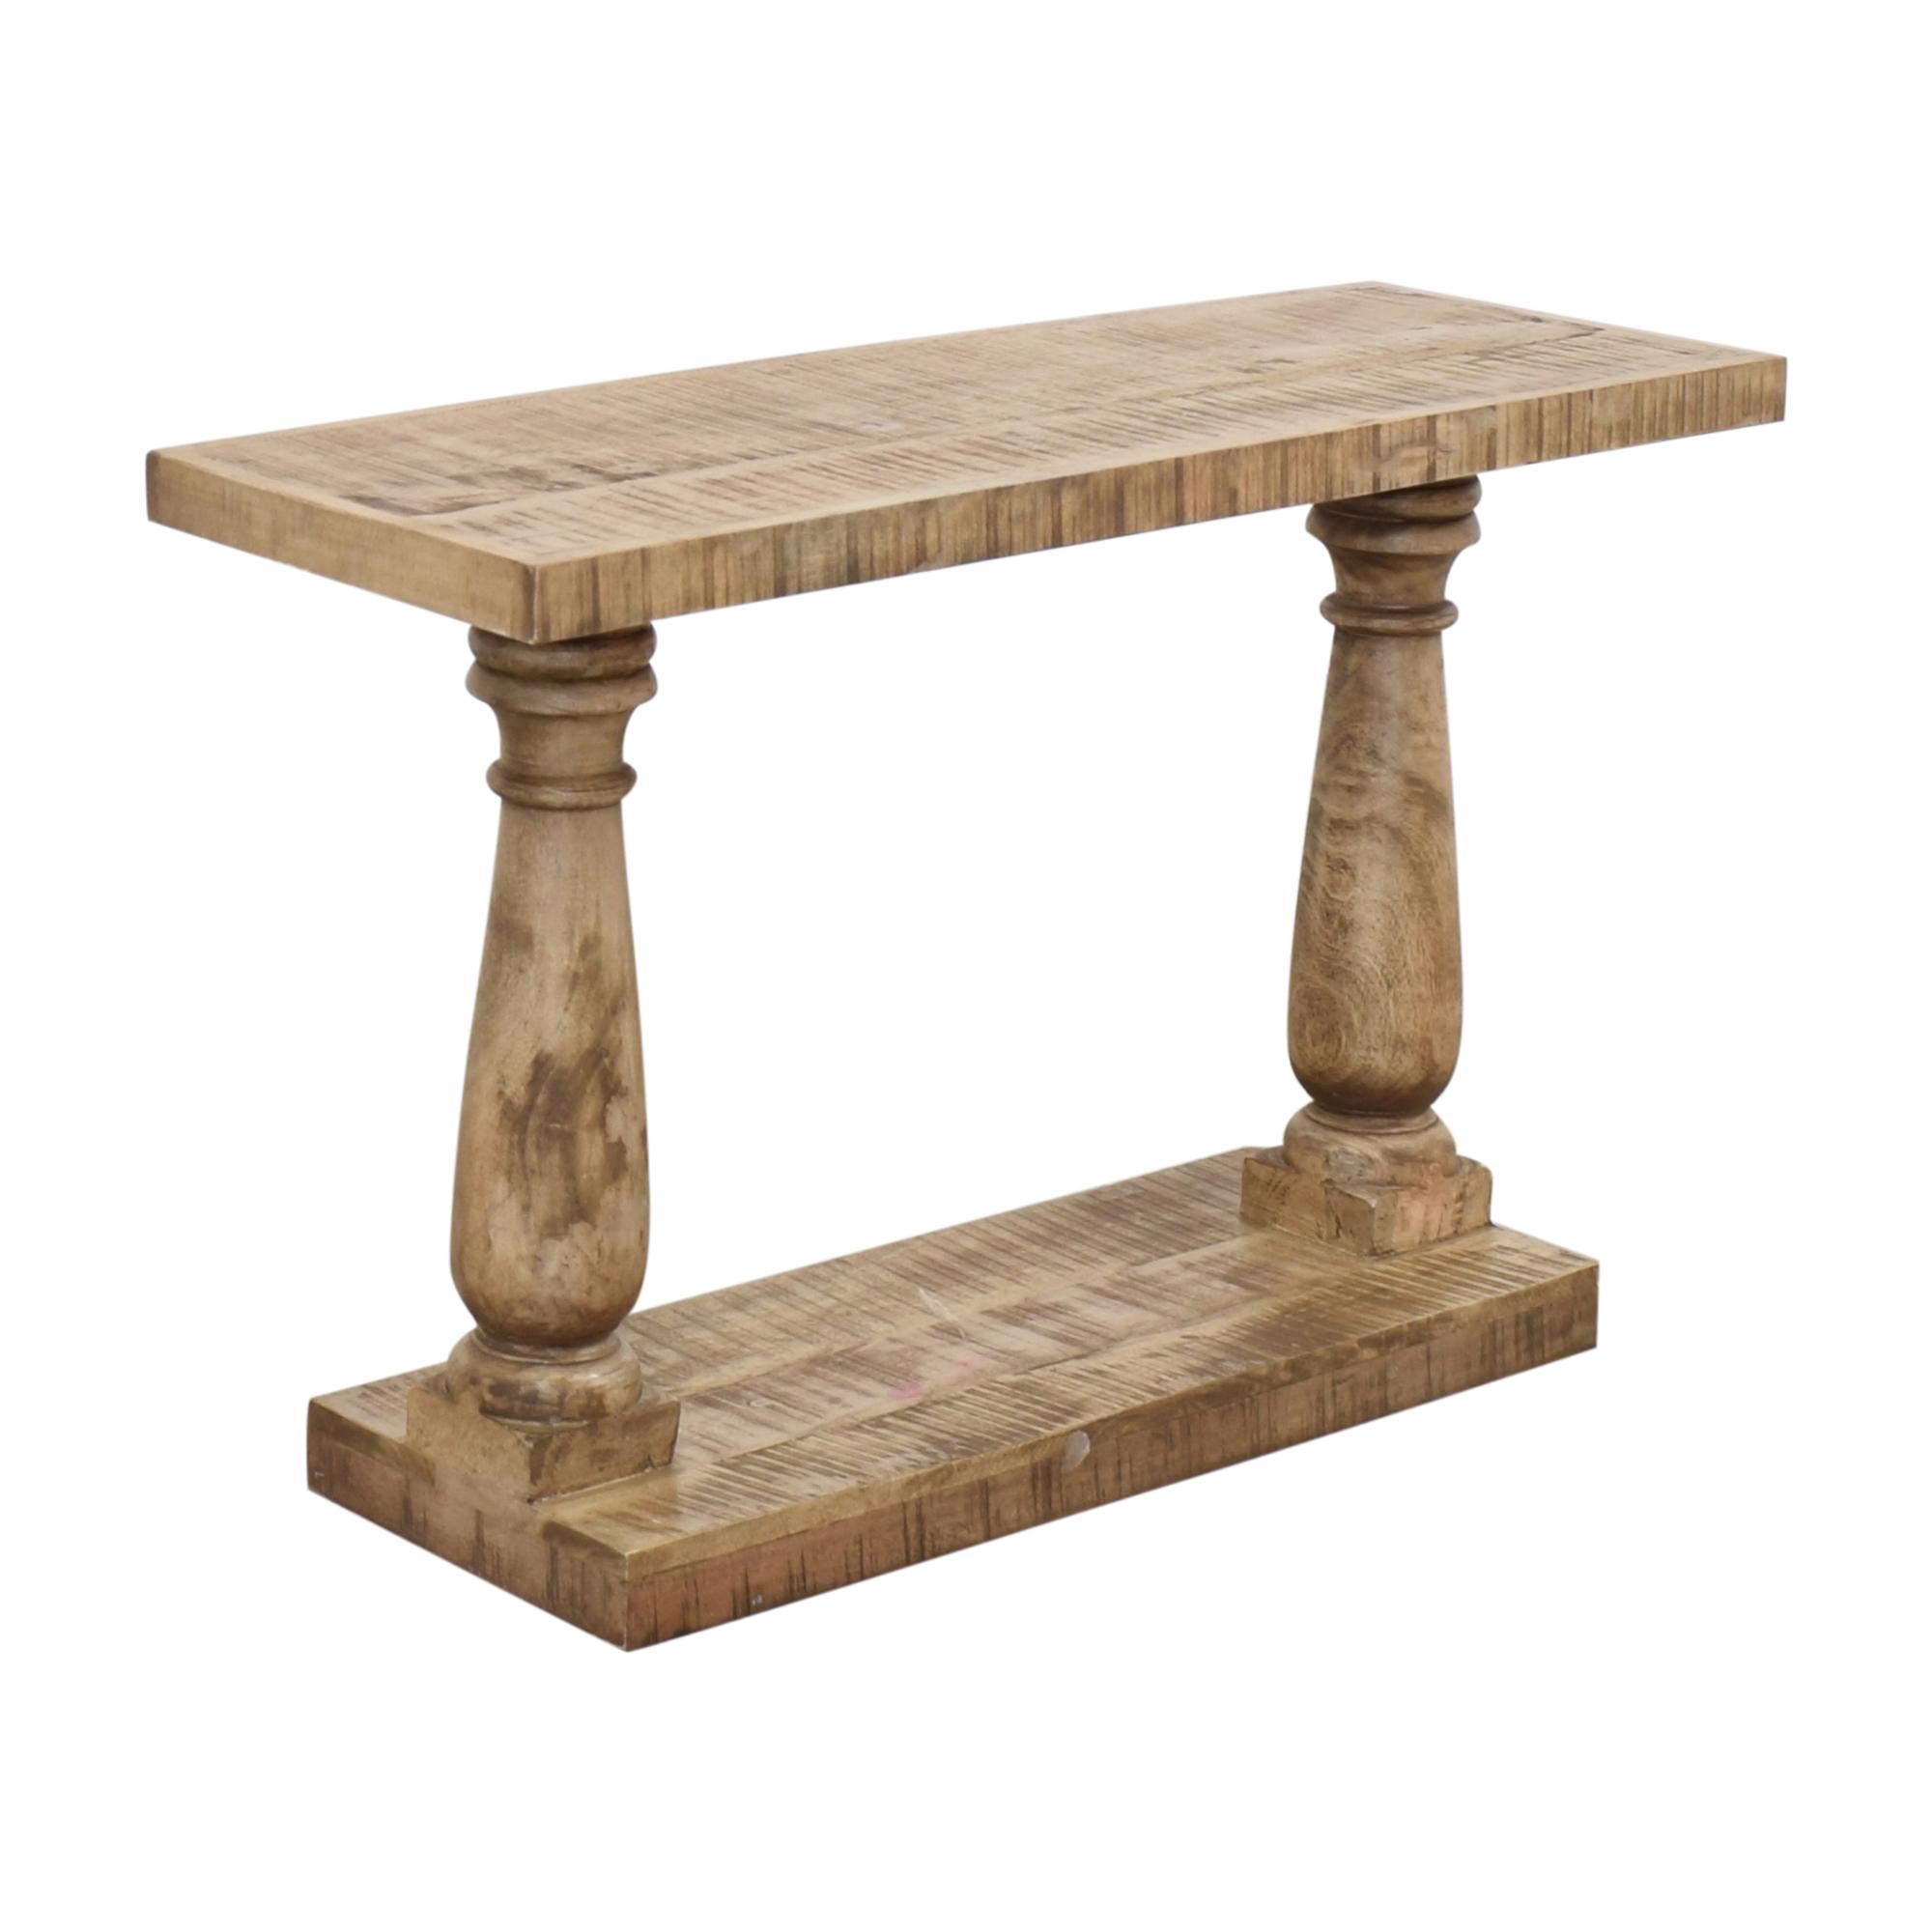 Macy's Macy's Rustic Turned Leg Console Table pa